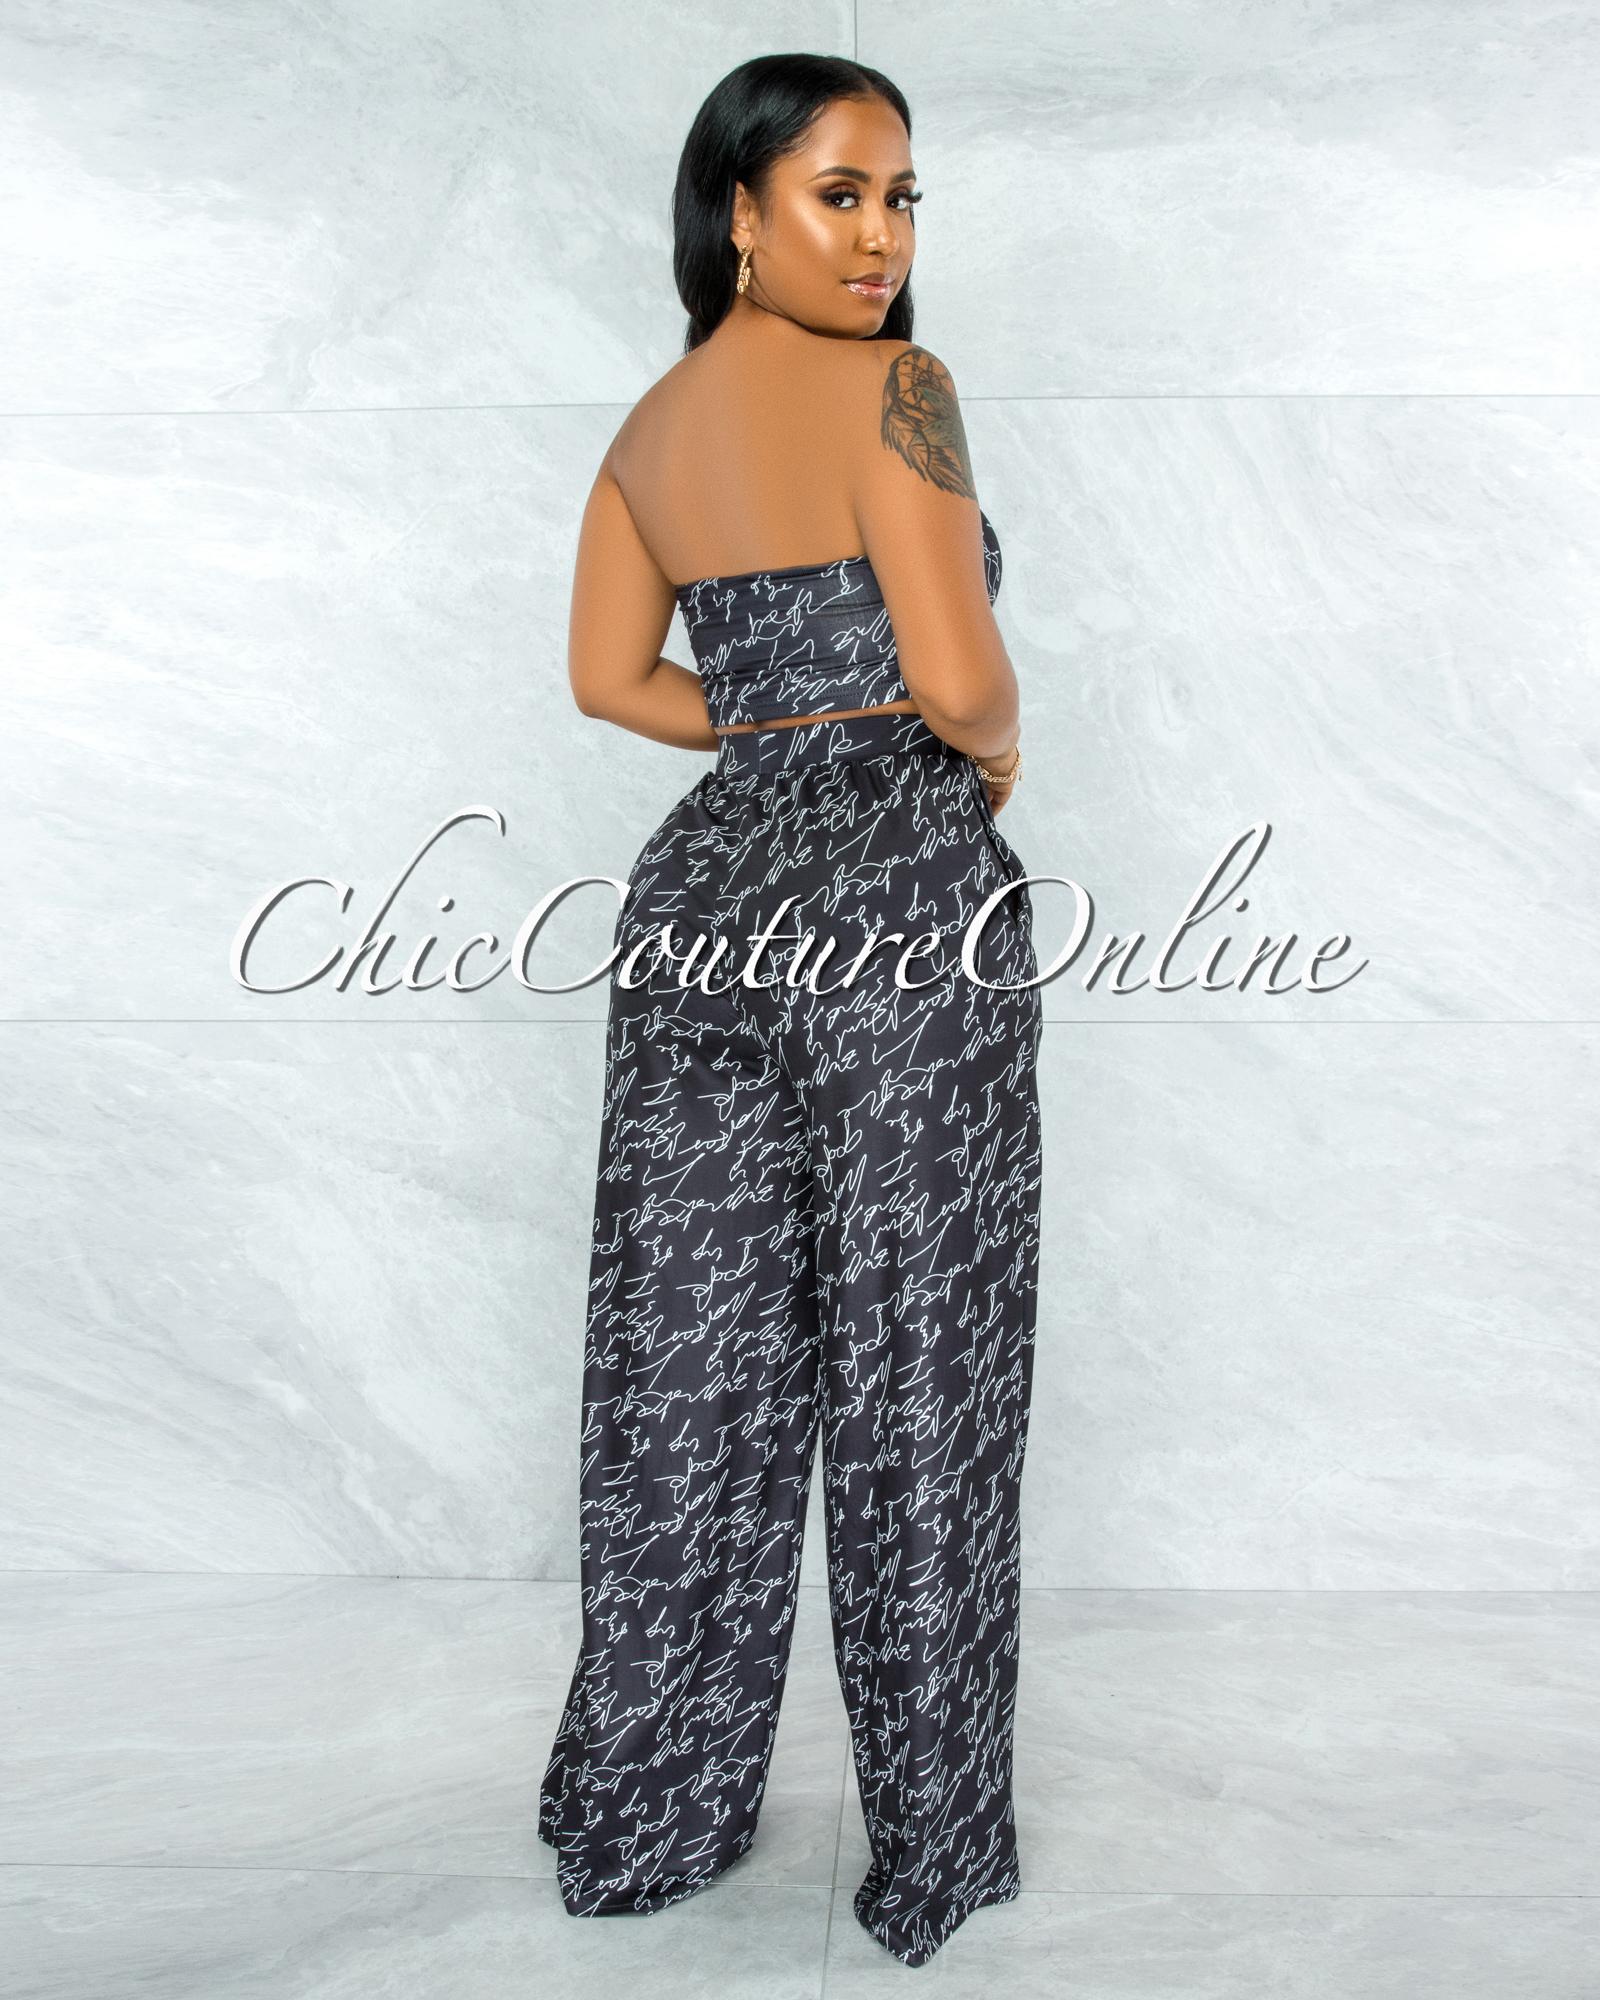 Yussell Black White Print Front Tie Top & Wide Legs Pants Set